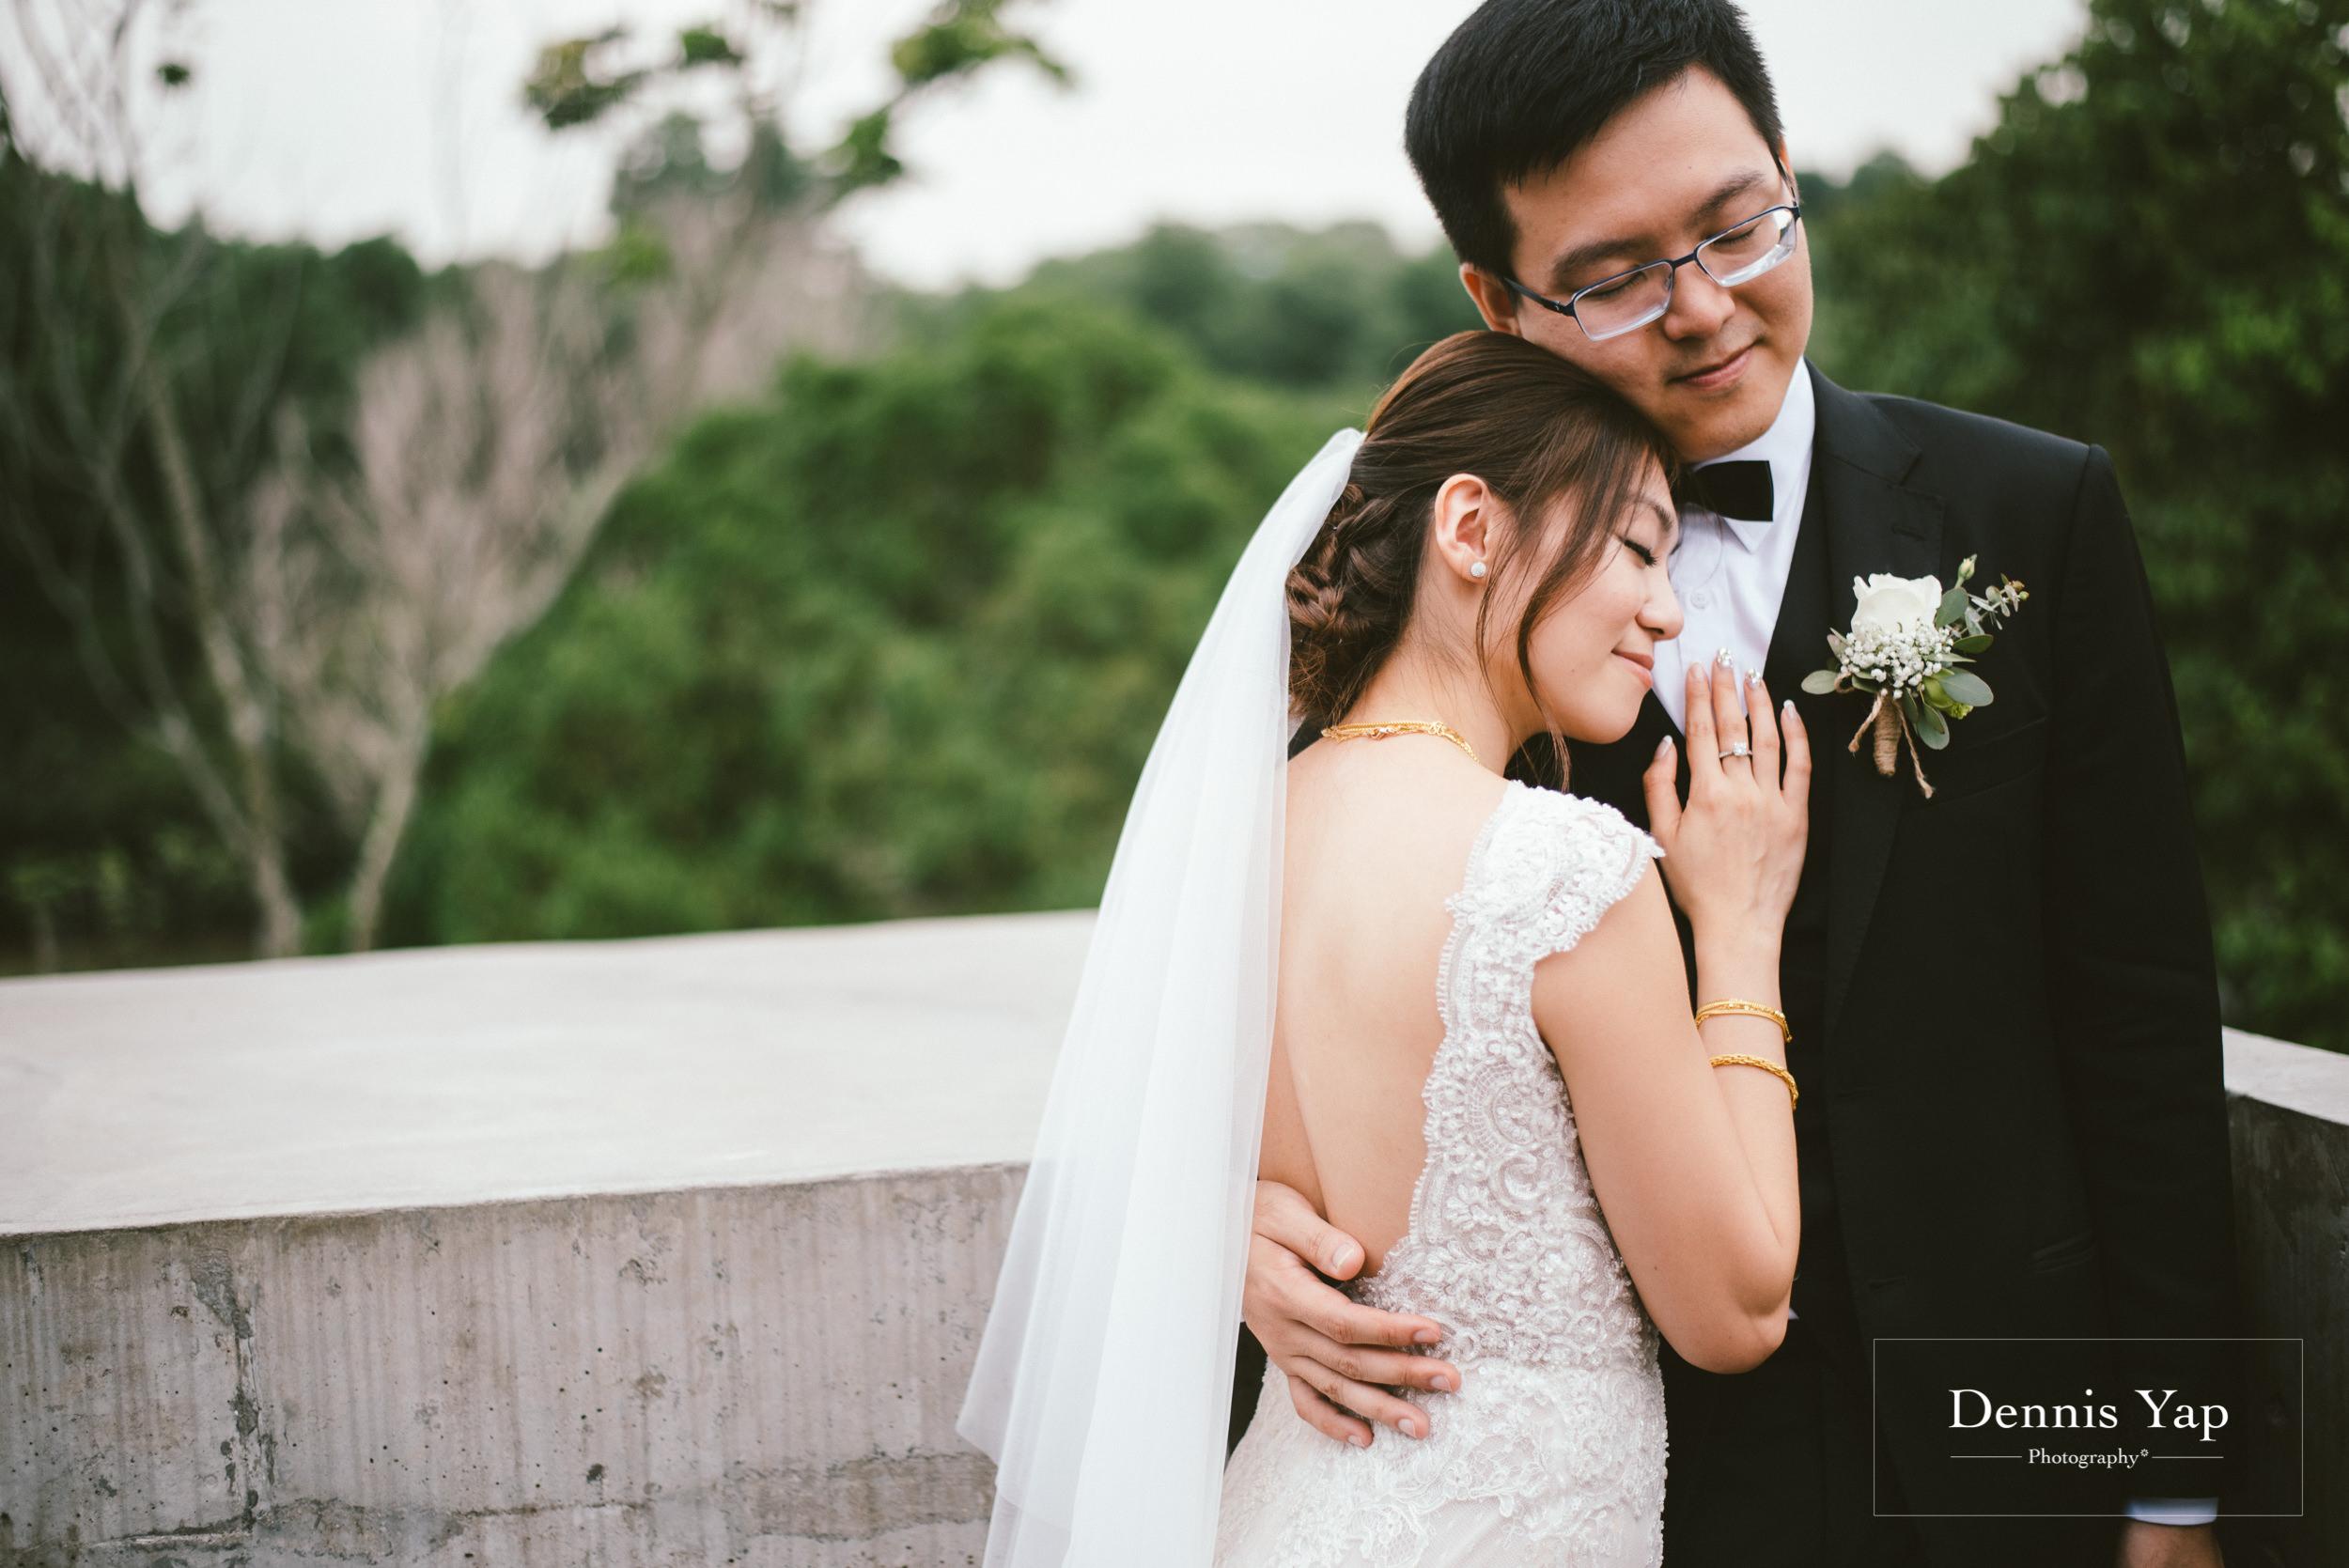 chuan wai angela wedding day bukit jelutong selangor malaysia dennis yap photography-15.jpg